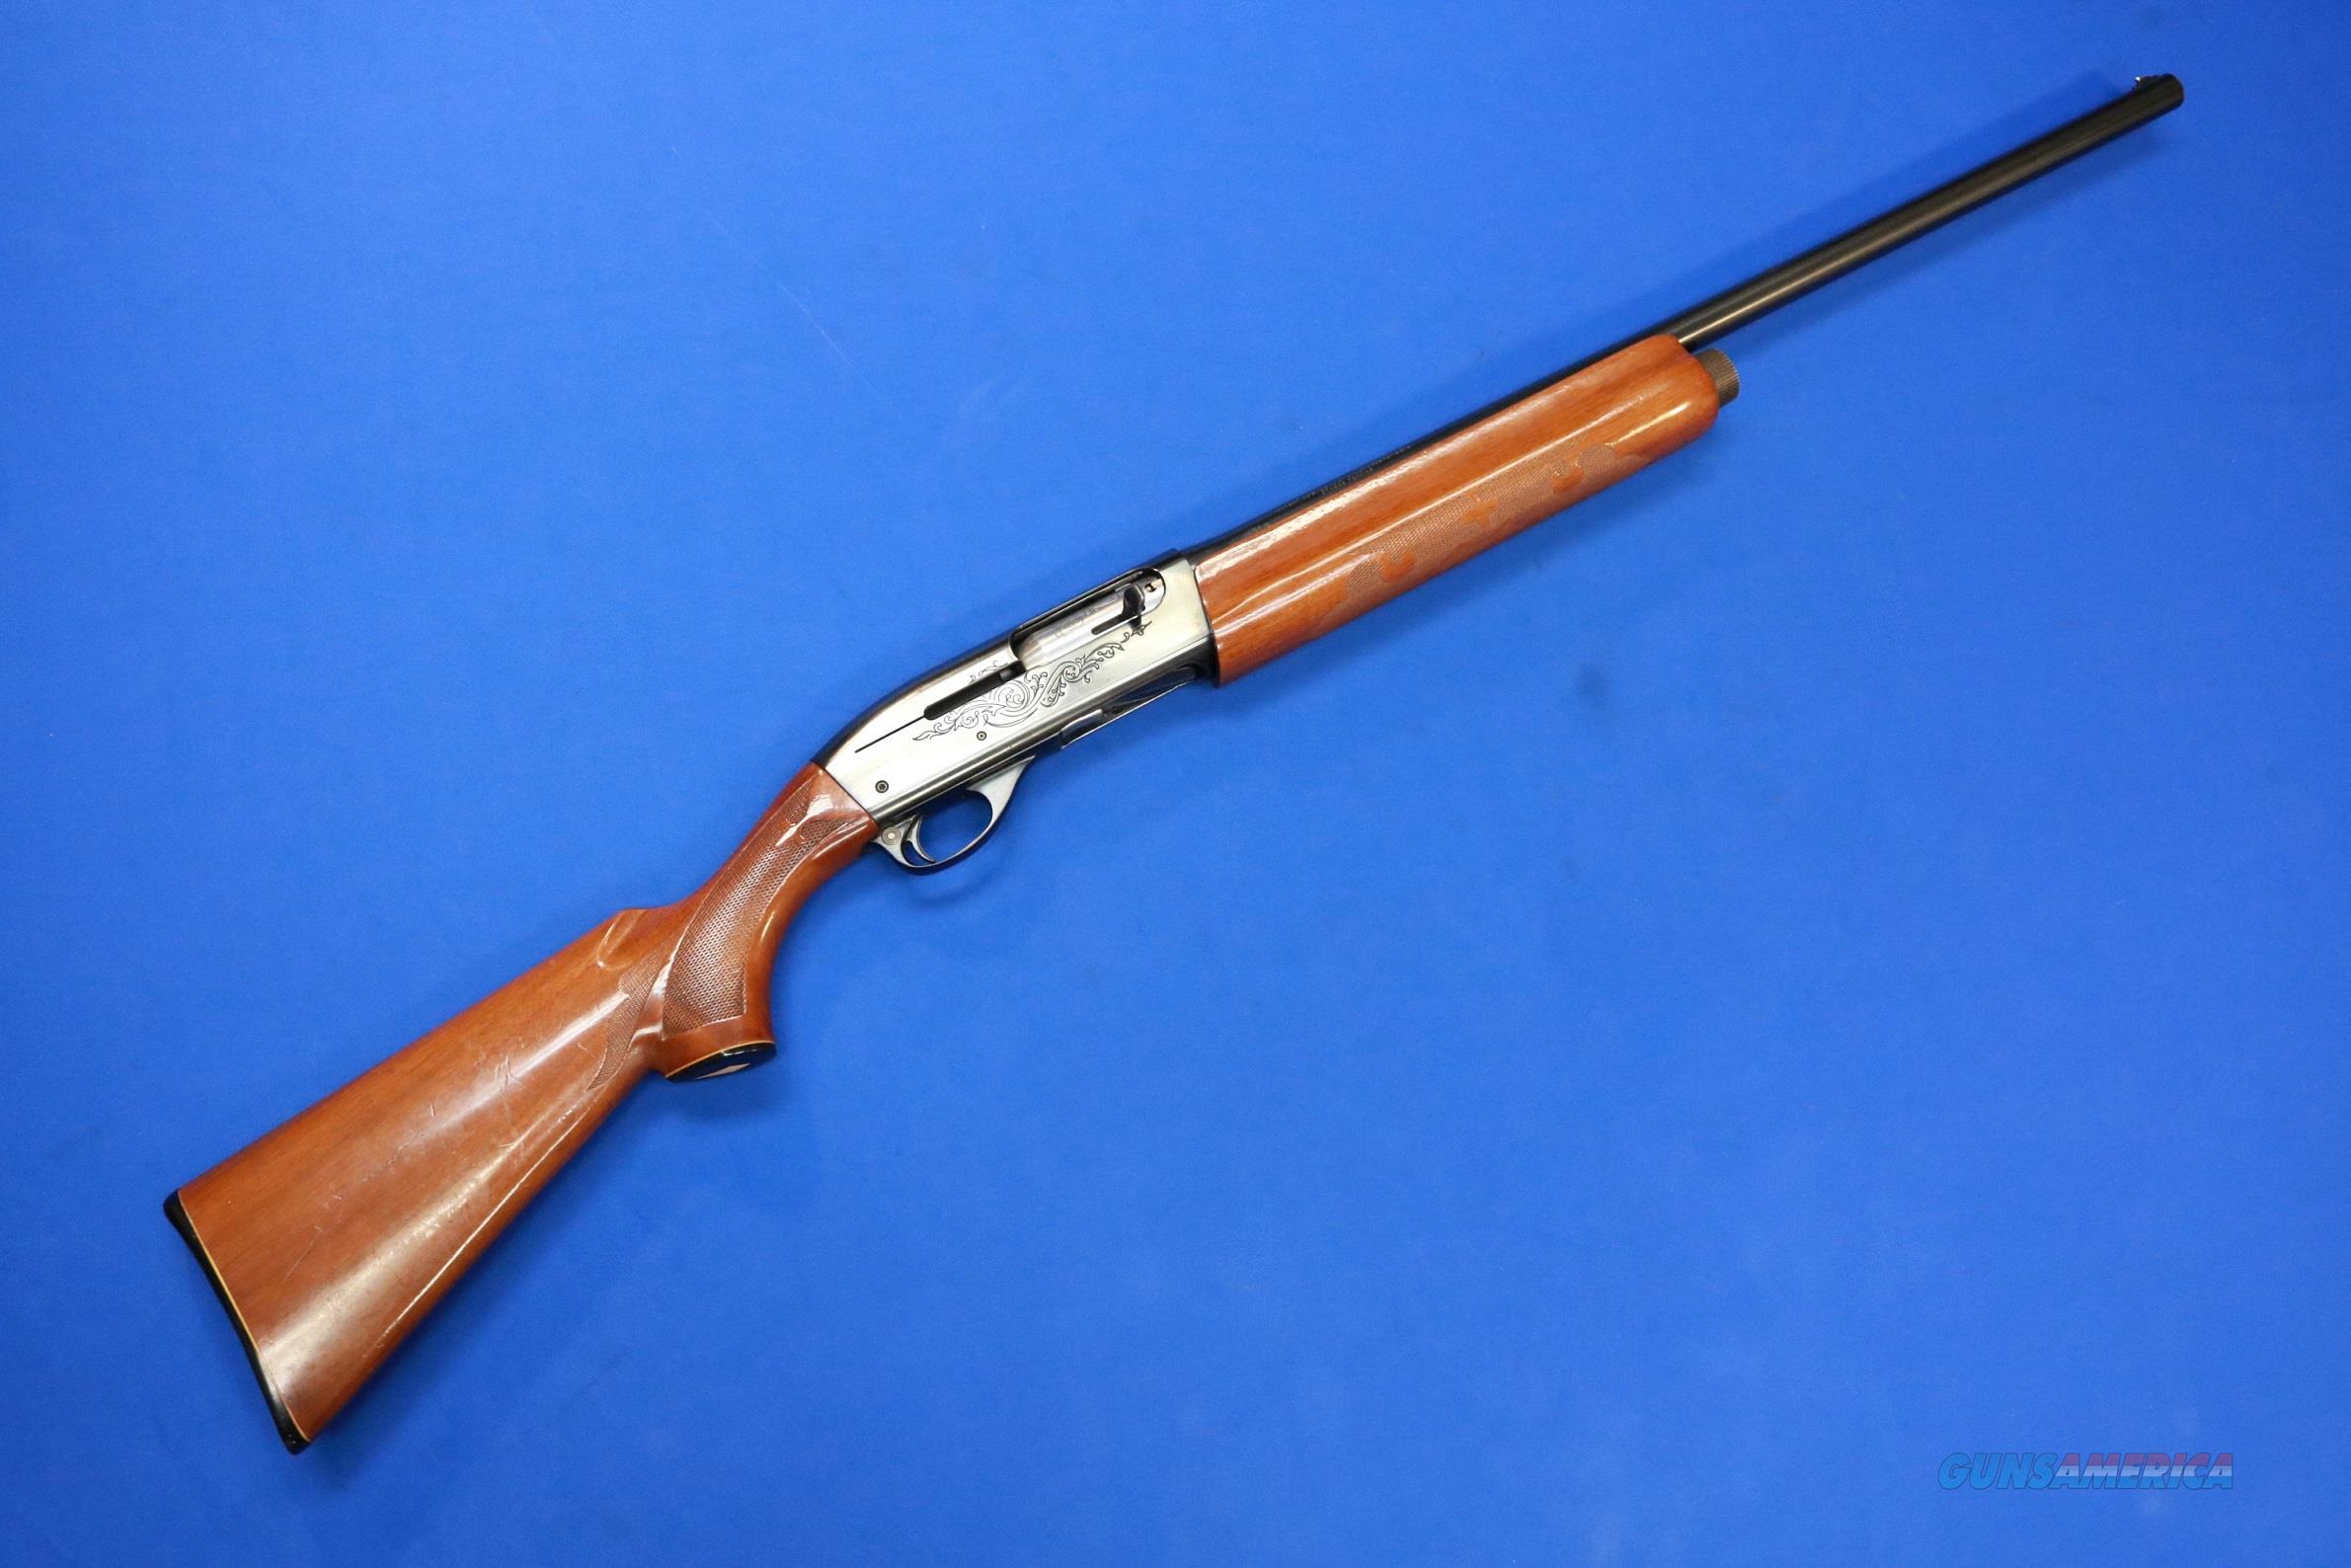 "REMINGTON MODEL 1100 12 GA 26"" IMPROVED CYLINDER  Guns > Shotguns > Remington Shotguns  > Autoloaders > Hunting"